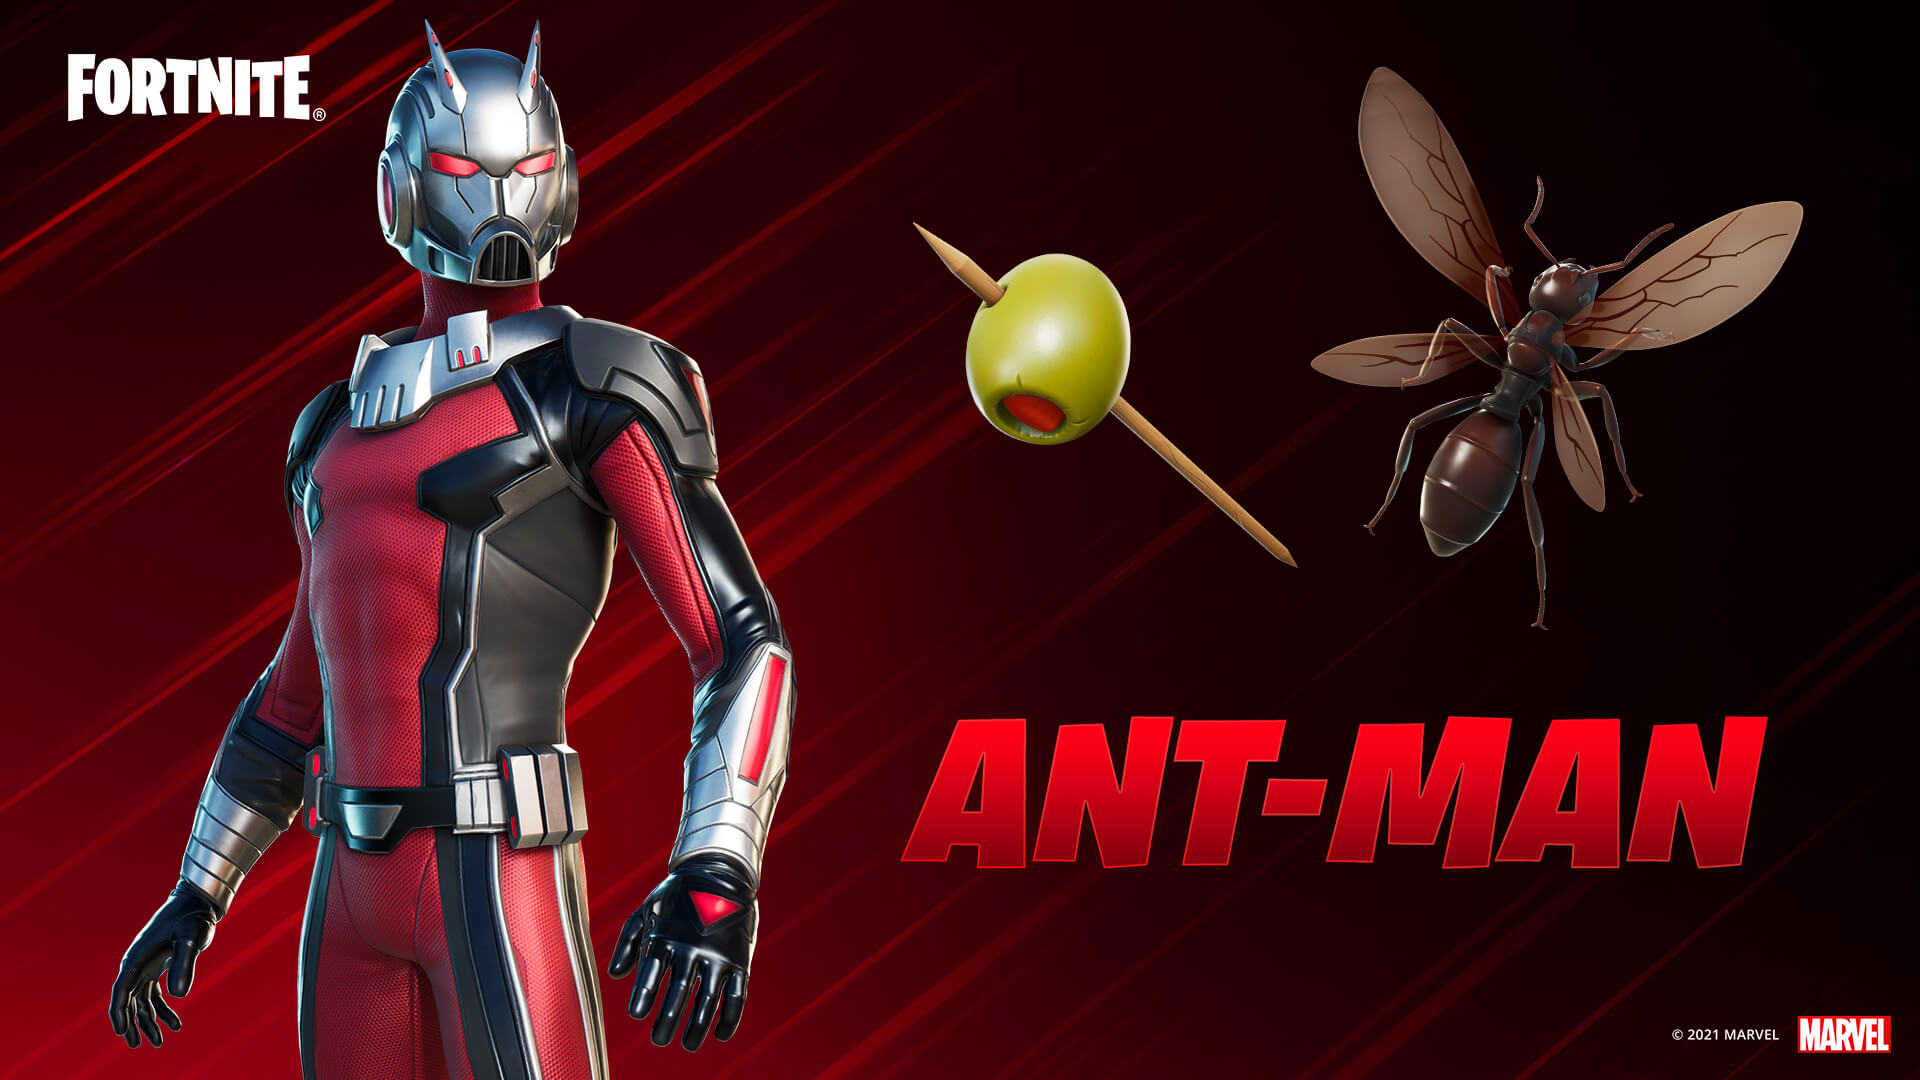 Ant-Man X Fortnite